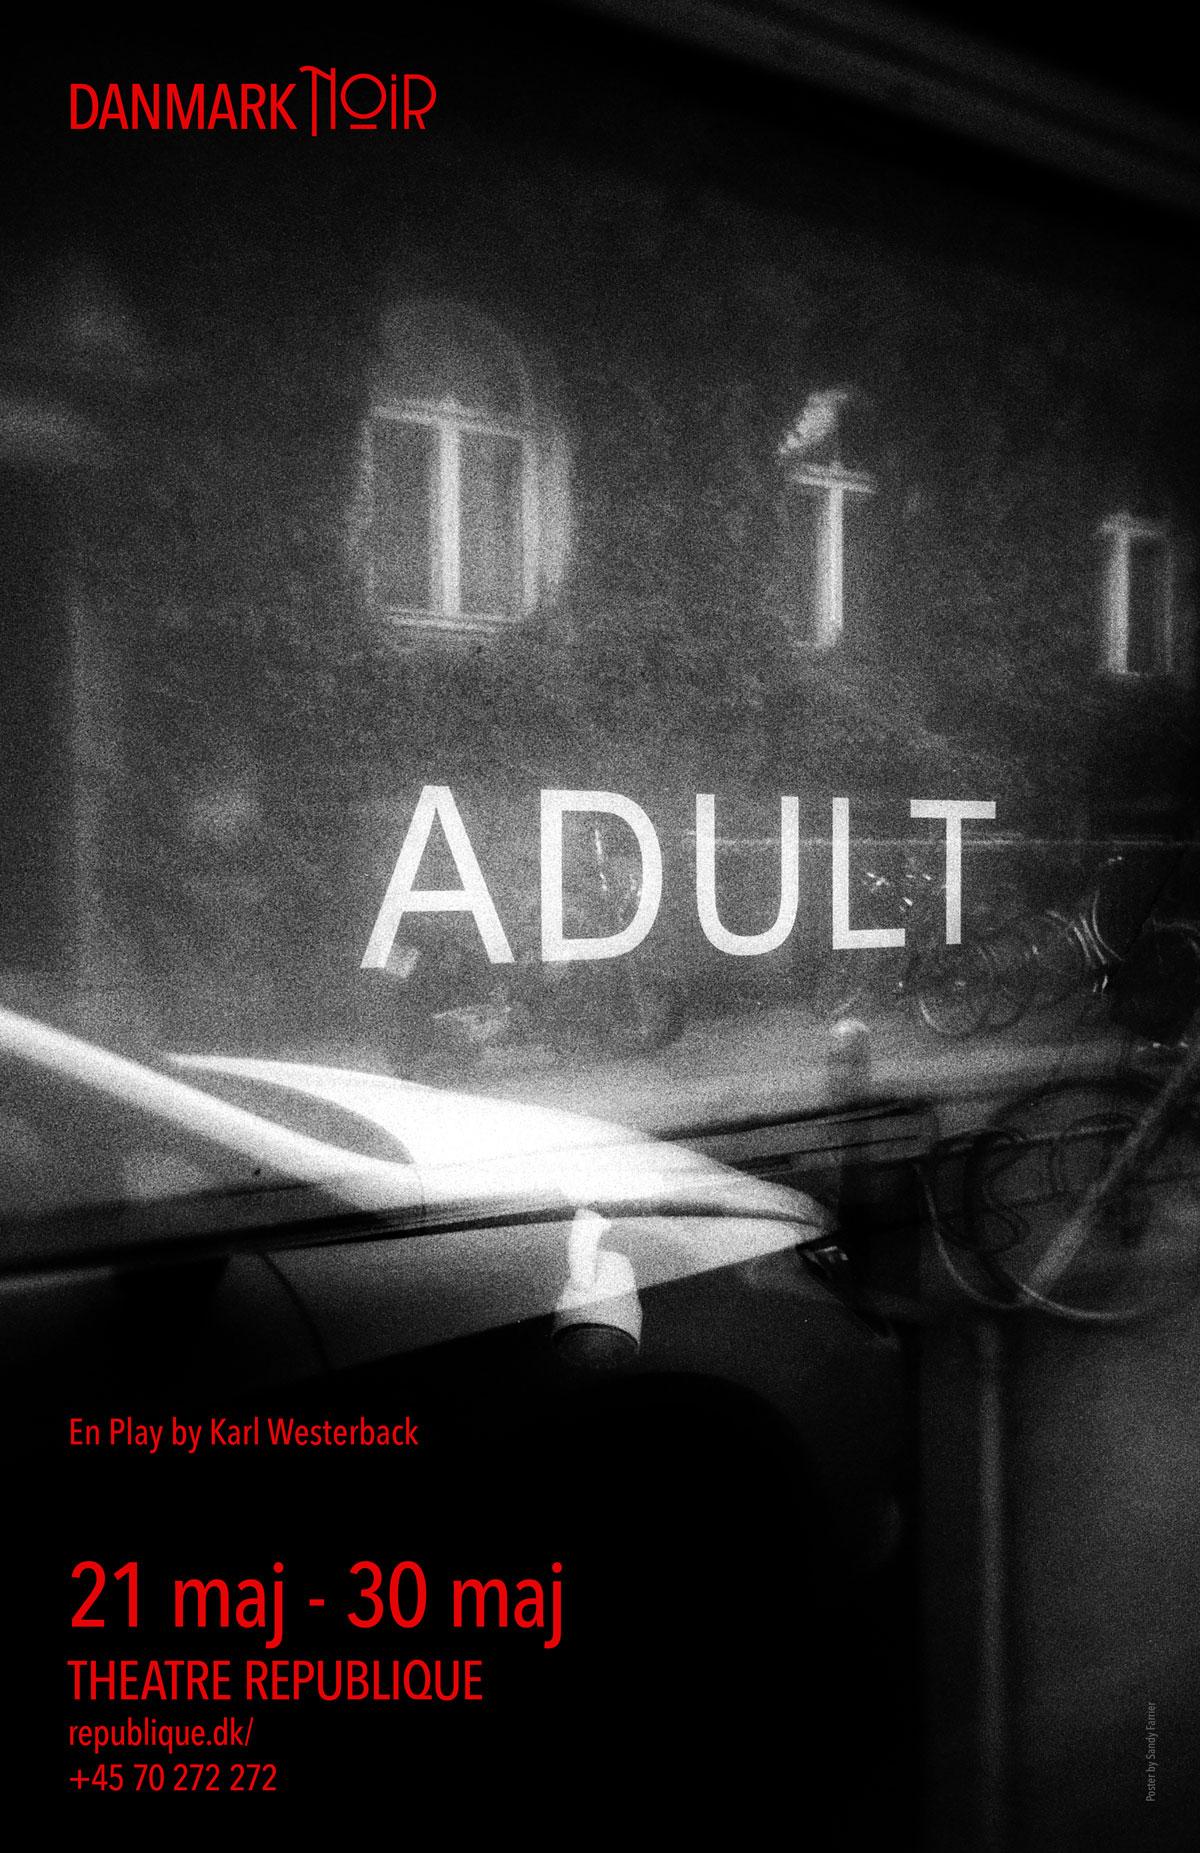 ADULT_01_FLAT.jpg